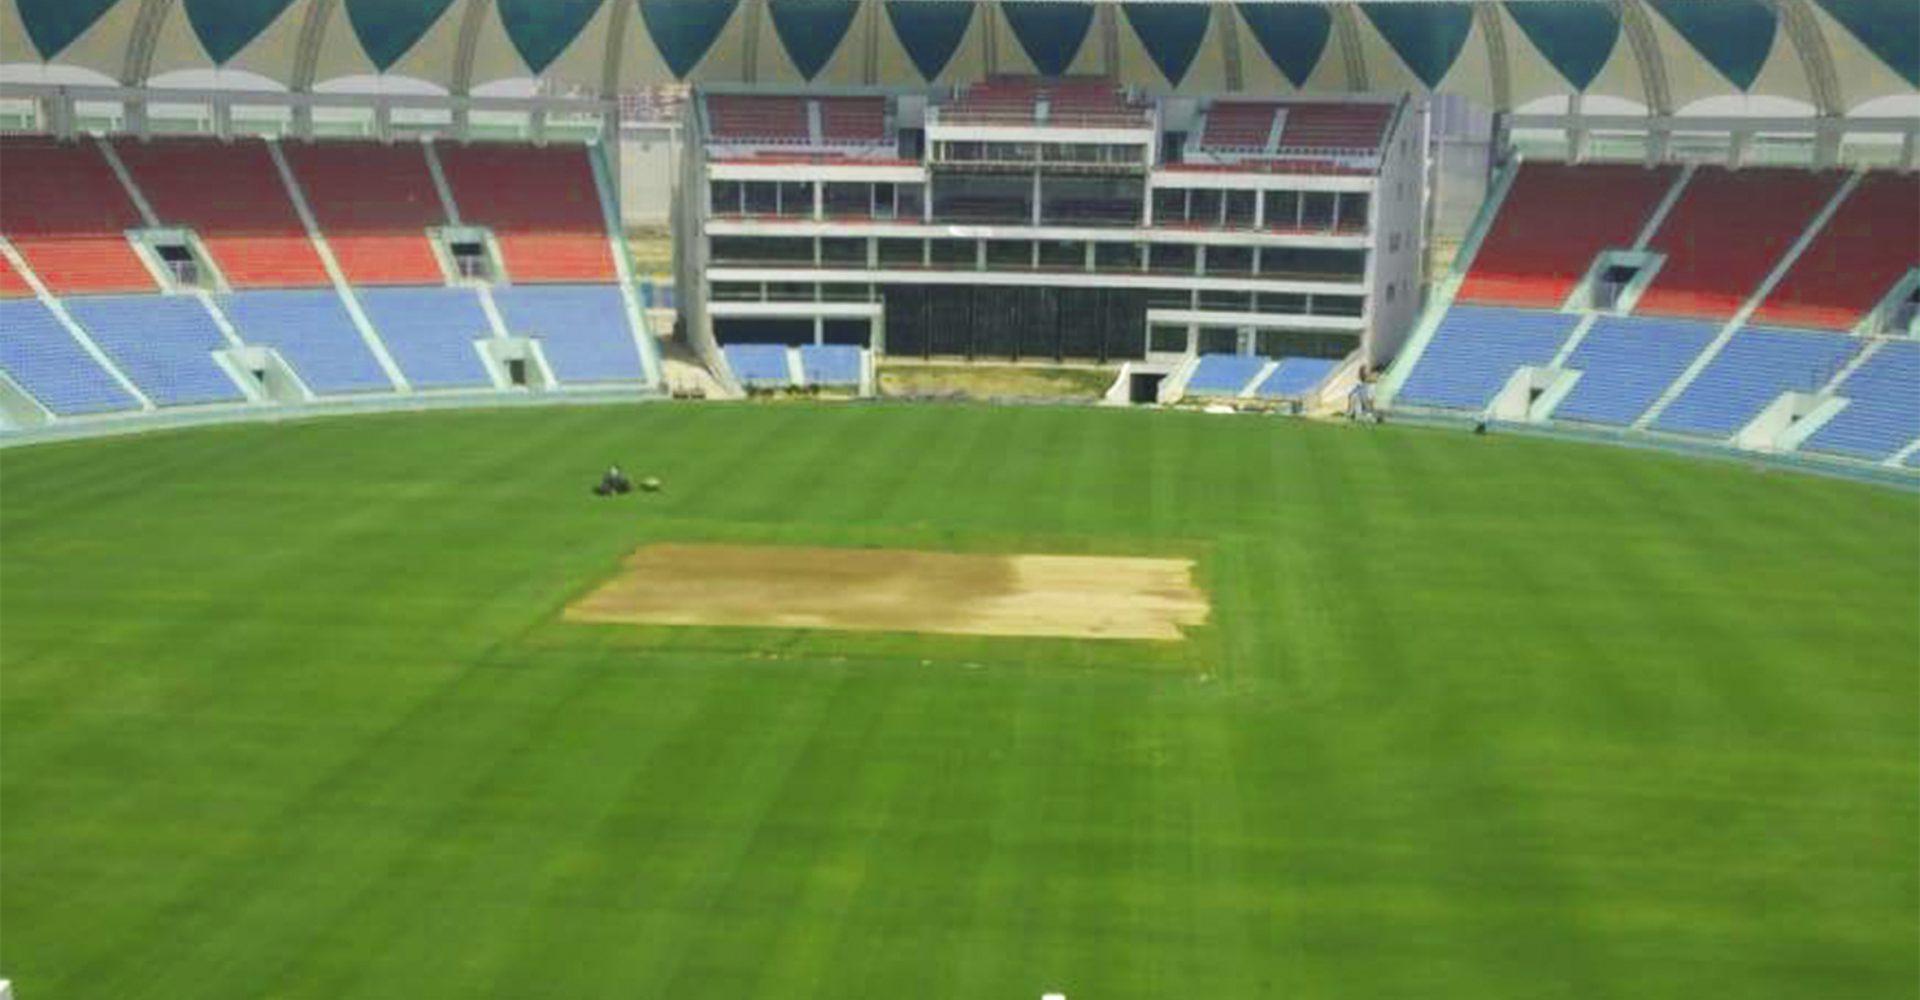 Picture of Ekana Lucknow Cricket Stadium of international standard